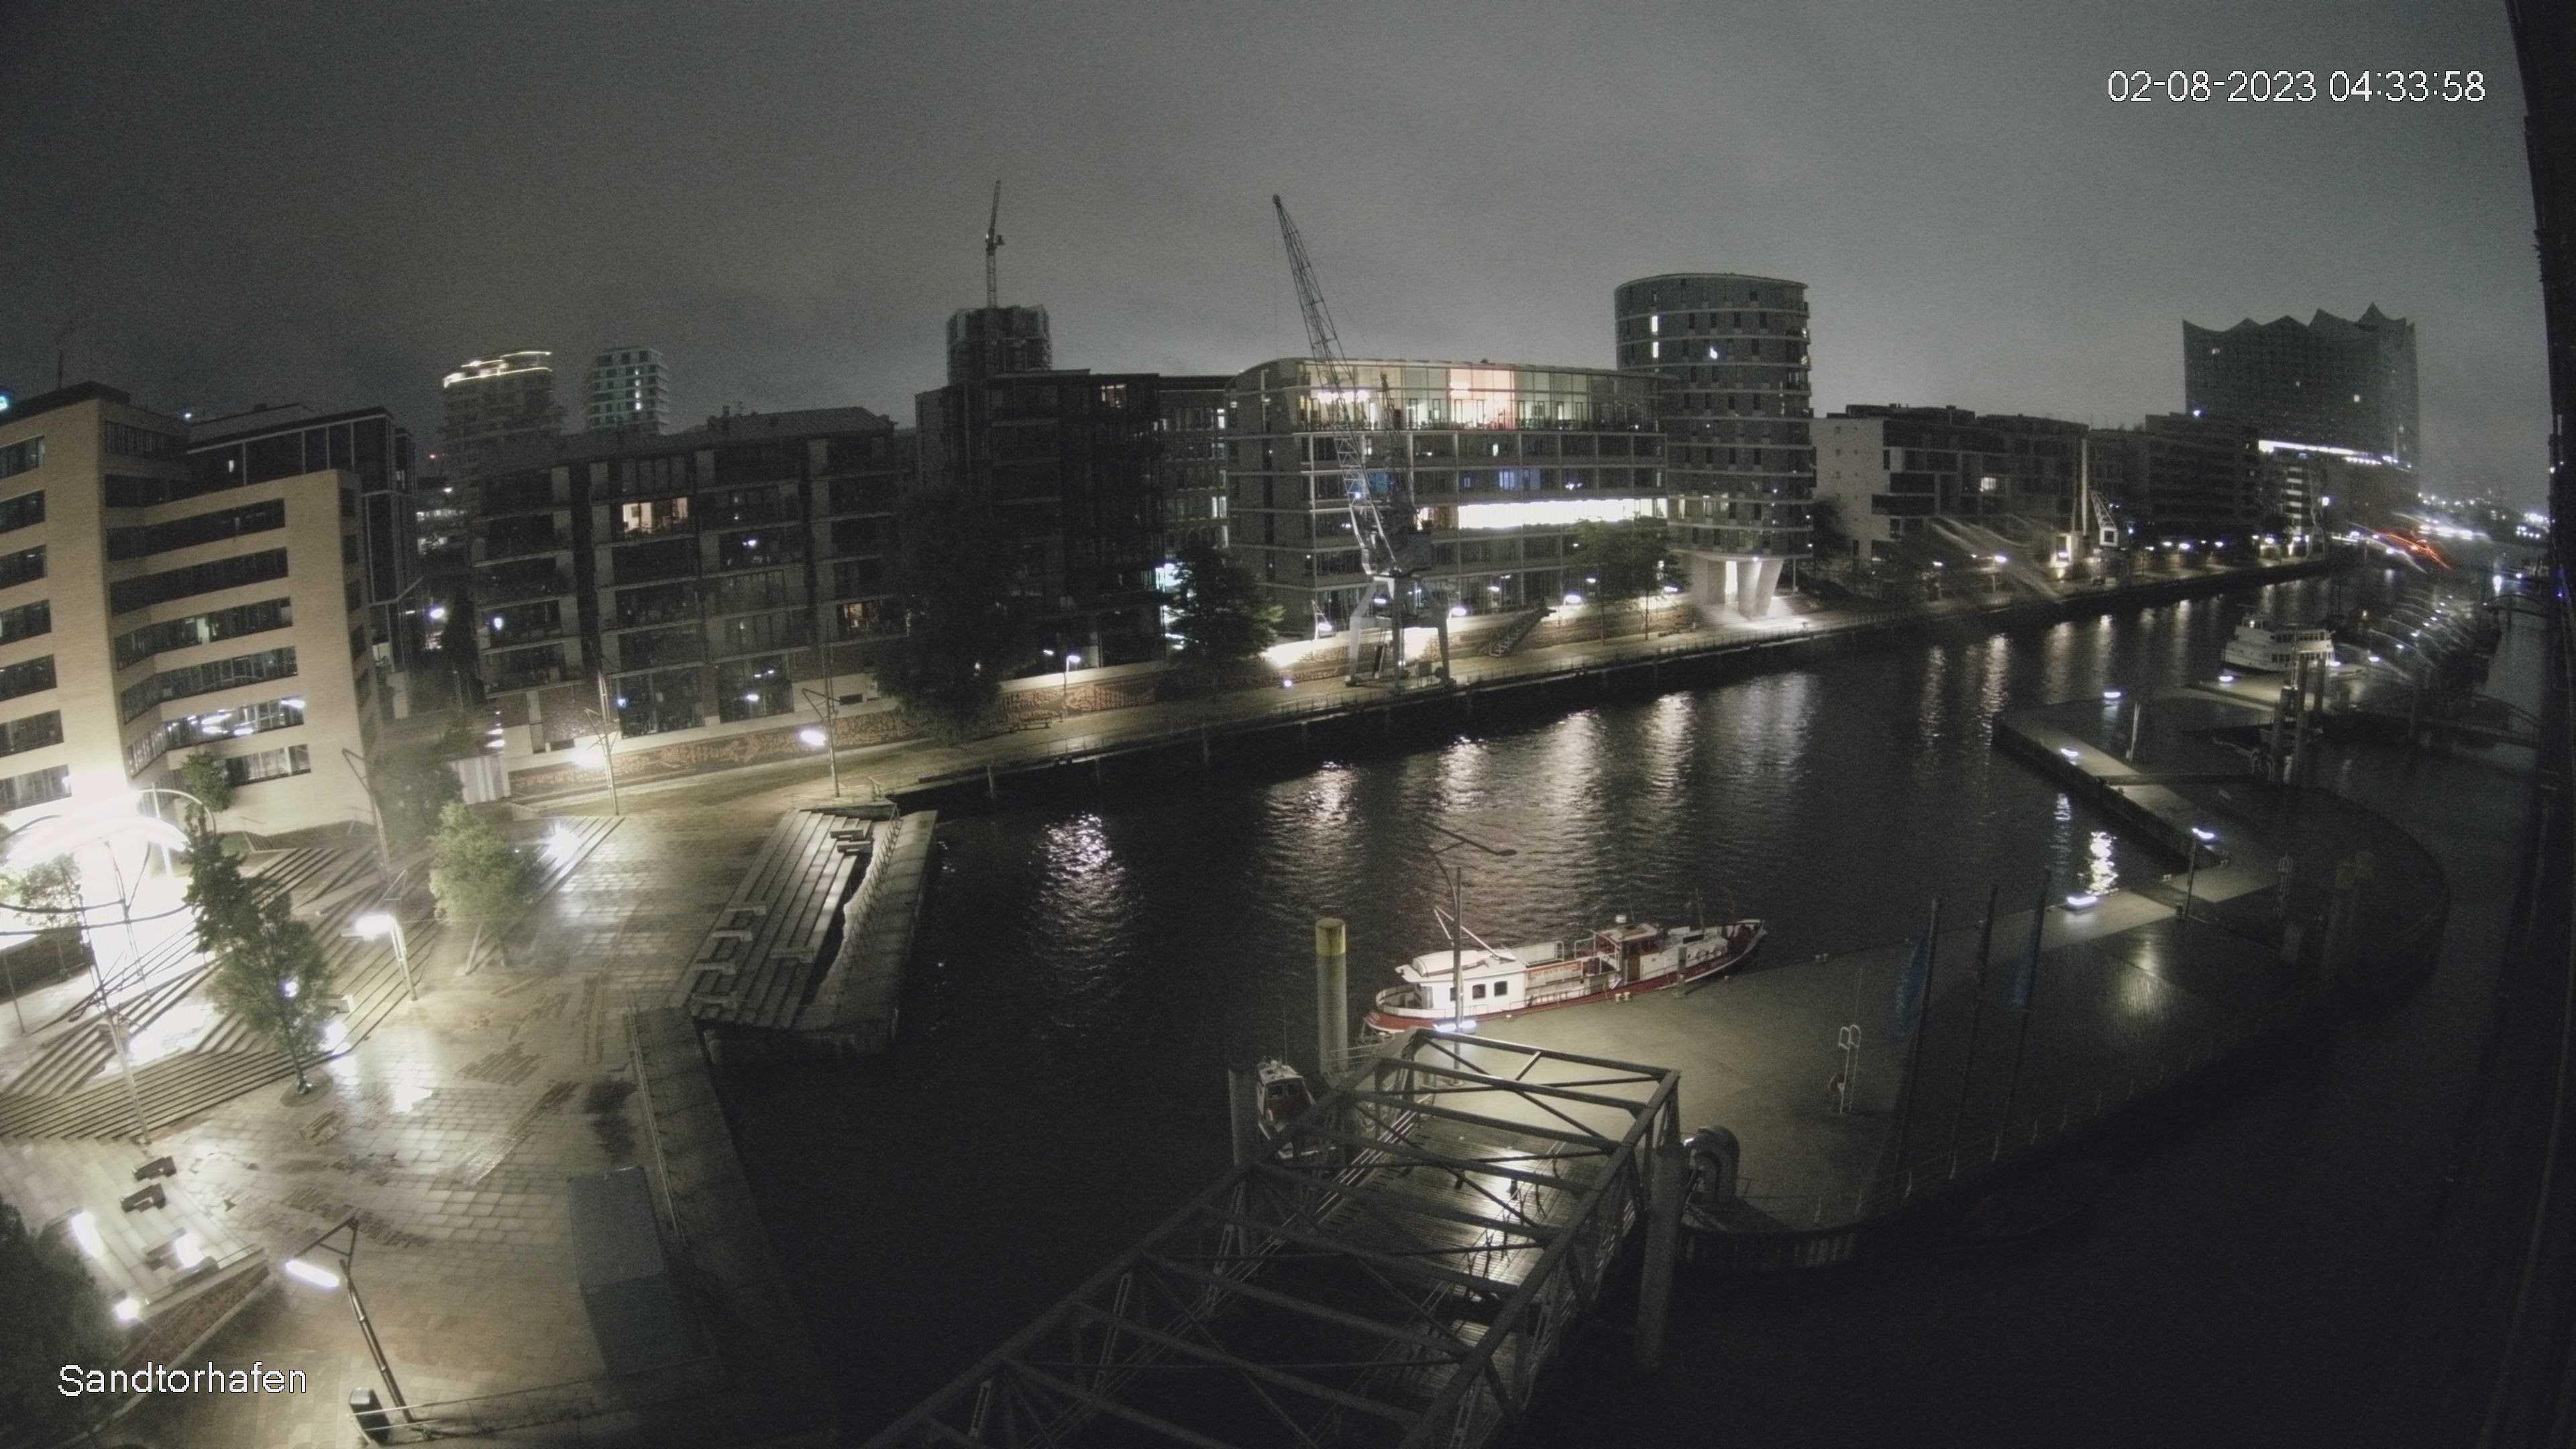 Hamburg Wed. 04:35